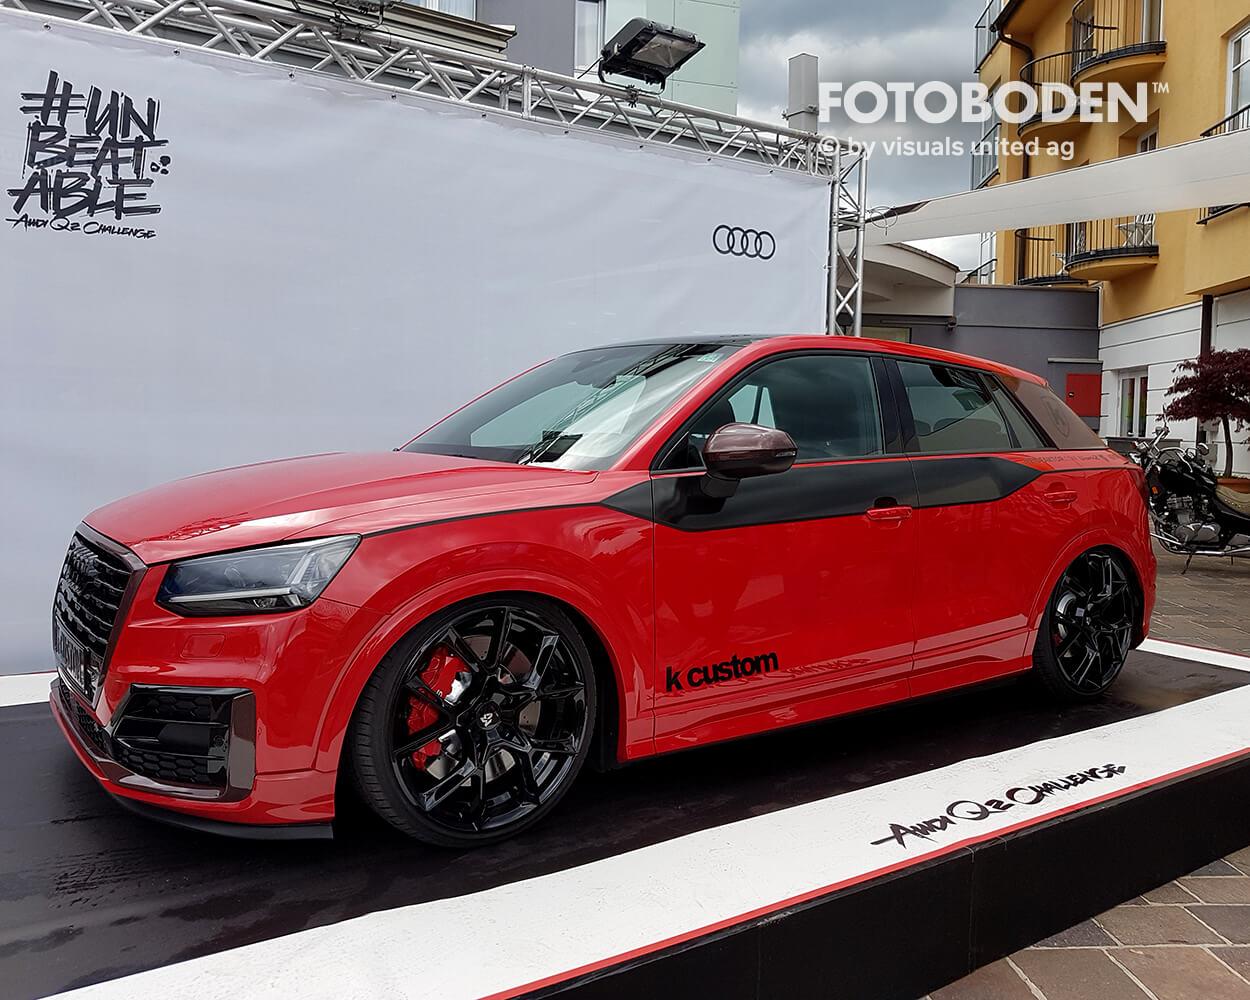 Audi Fotoboden Flooring Fußboden Bodengestaltung Floorminder Bodendruck Werbung Fußbodenwerbung Bodenwerbung Merchandising Advertising Visualmerchandising6